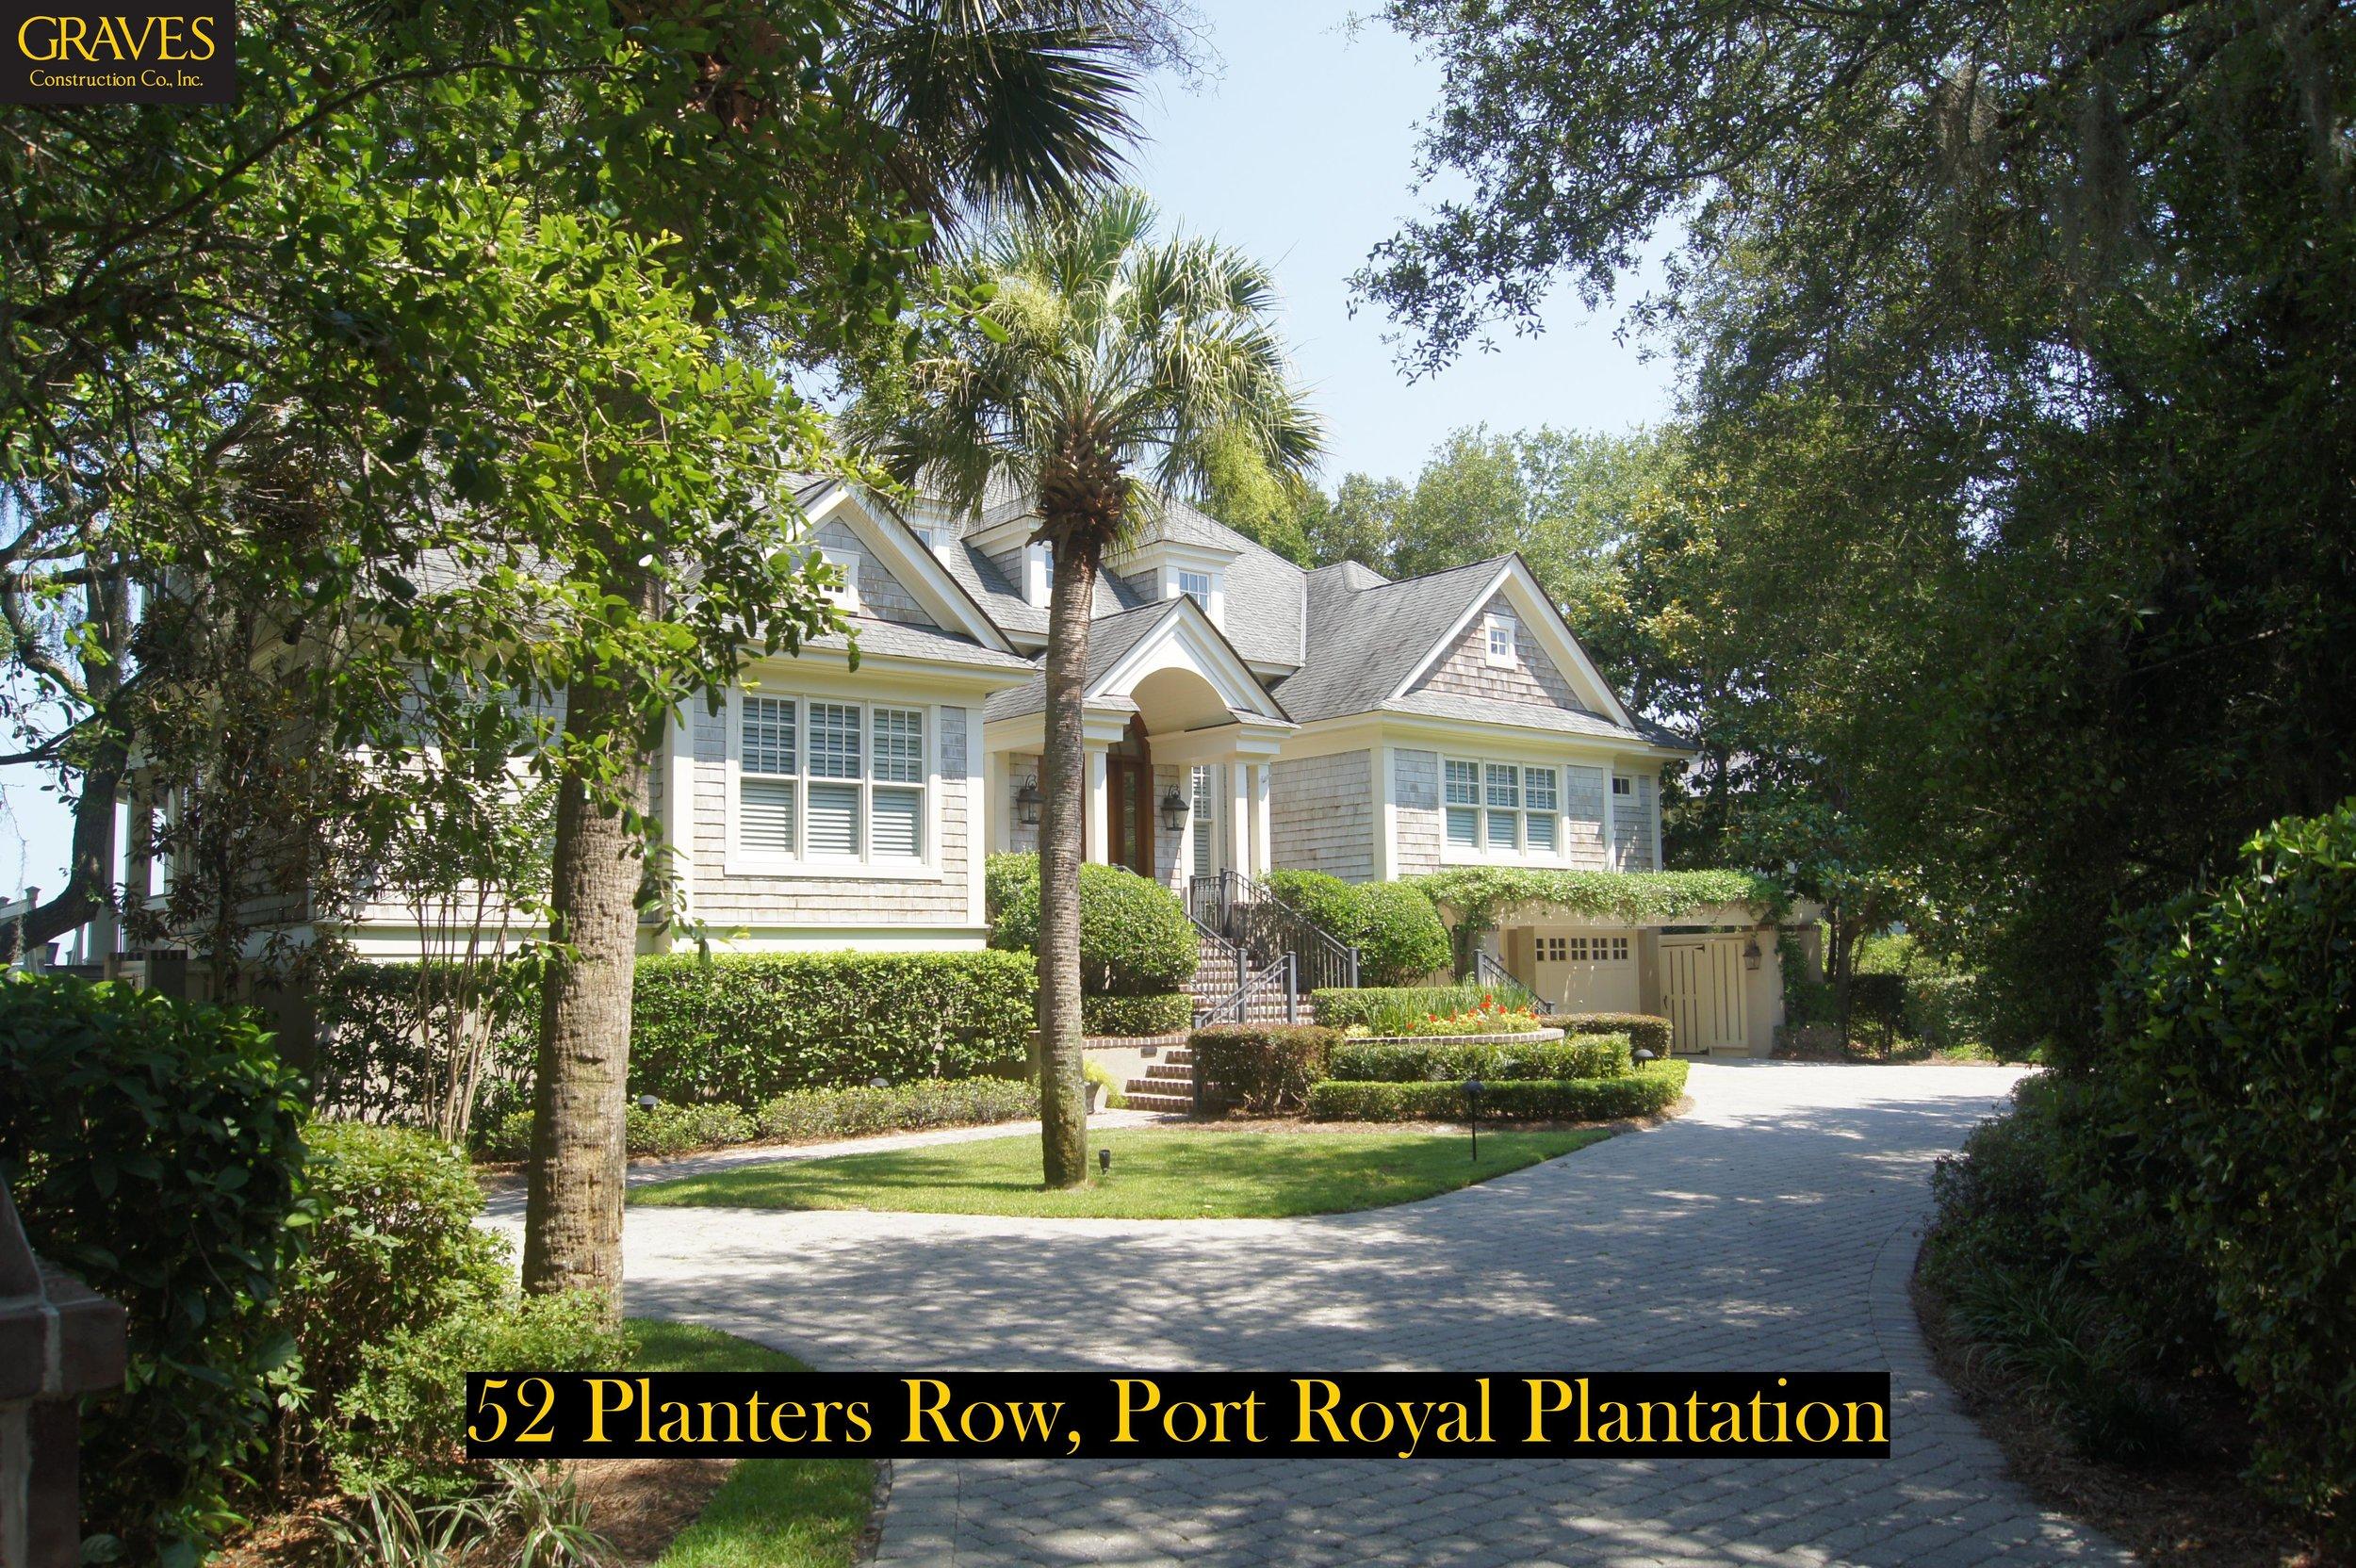 52 Planters Row - 1